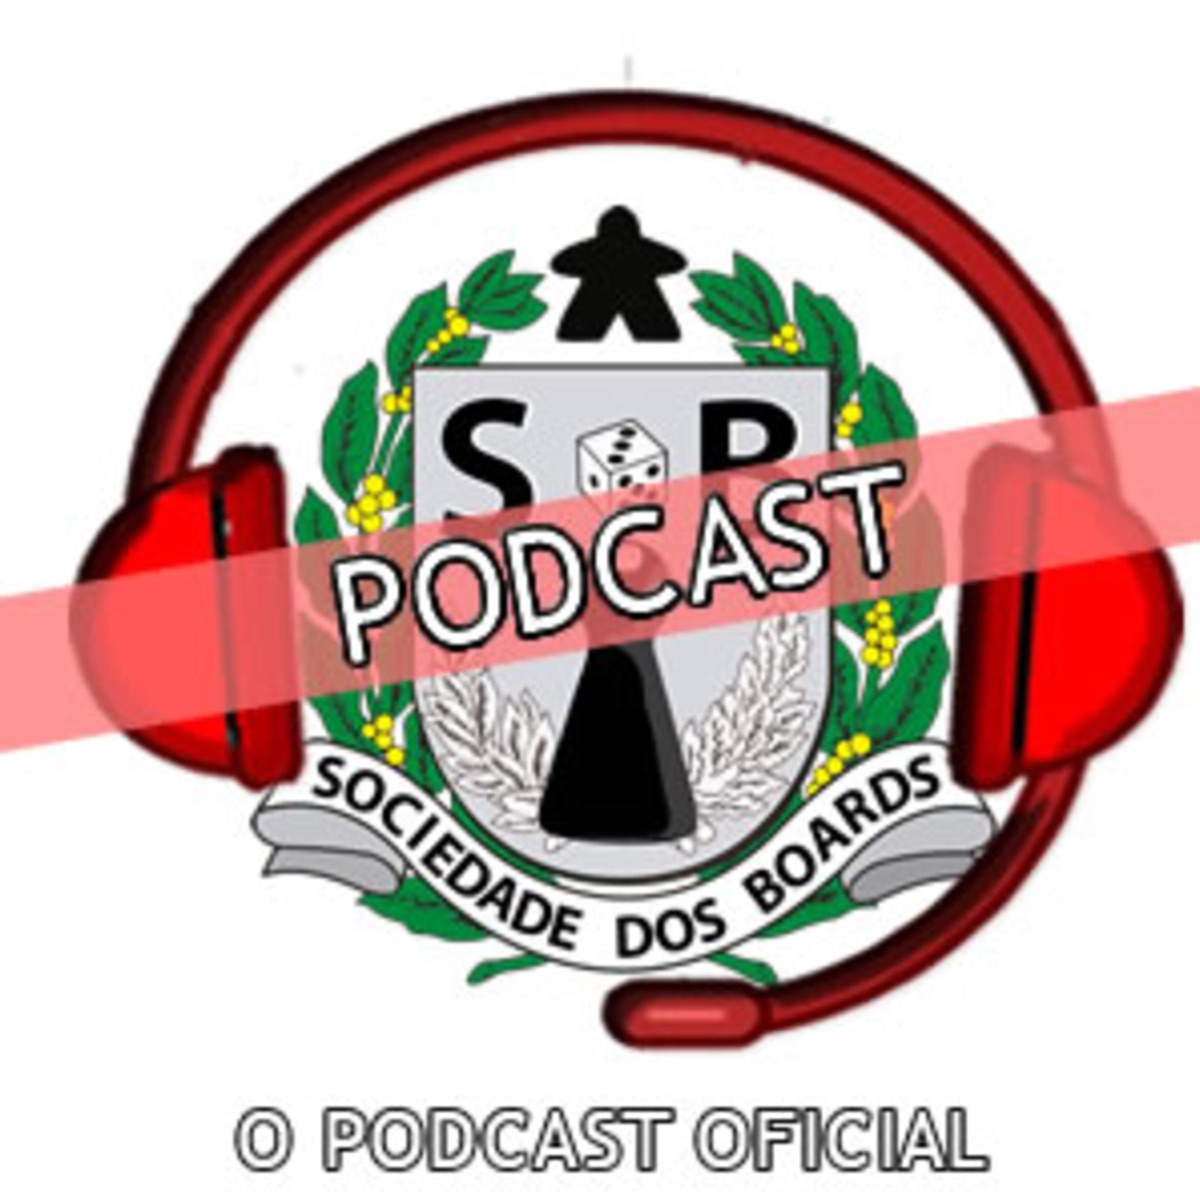 Podcast oficial da Sociedade dos Boards